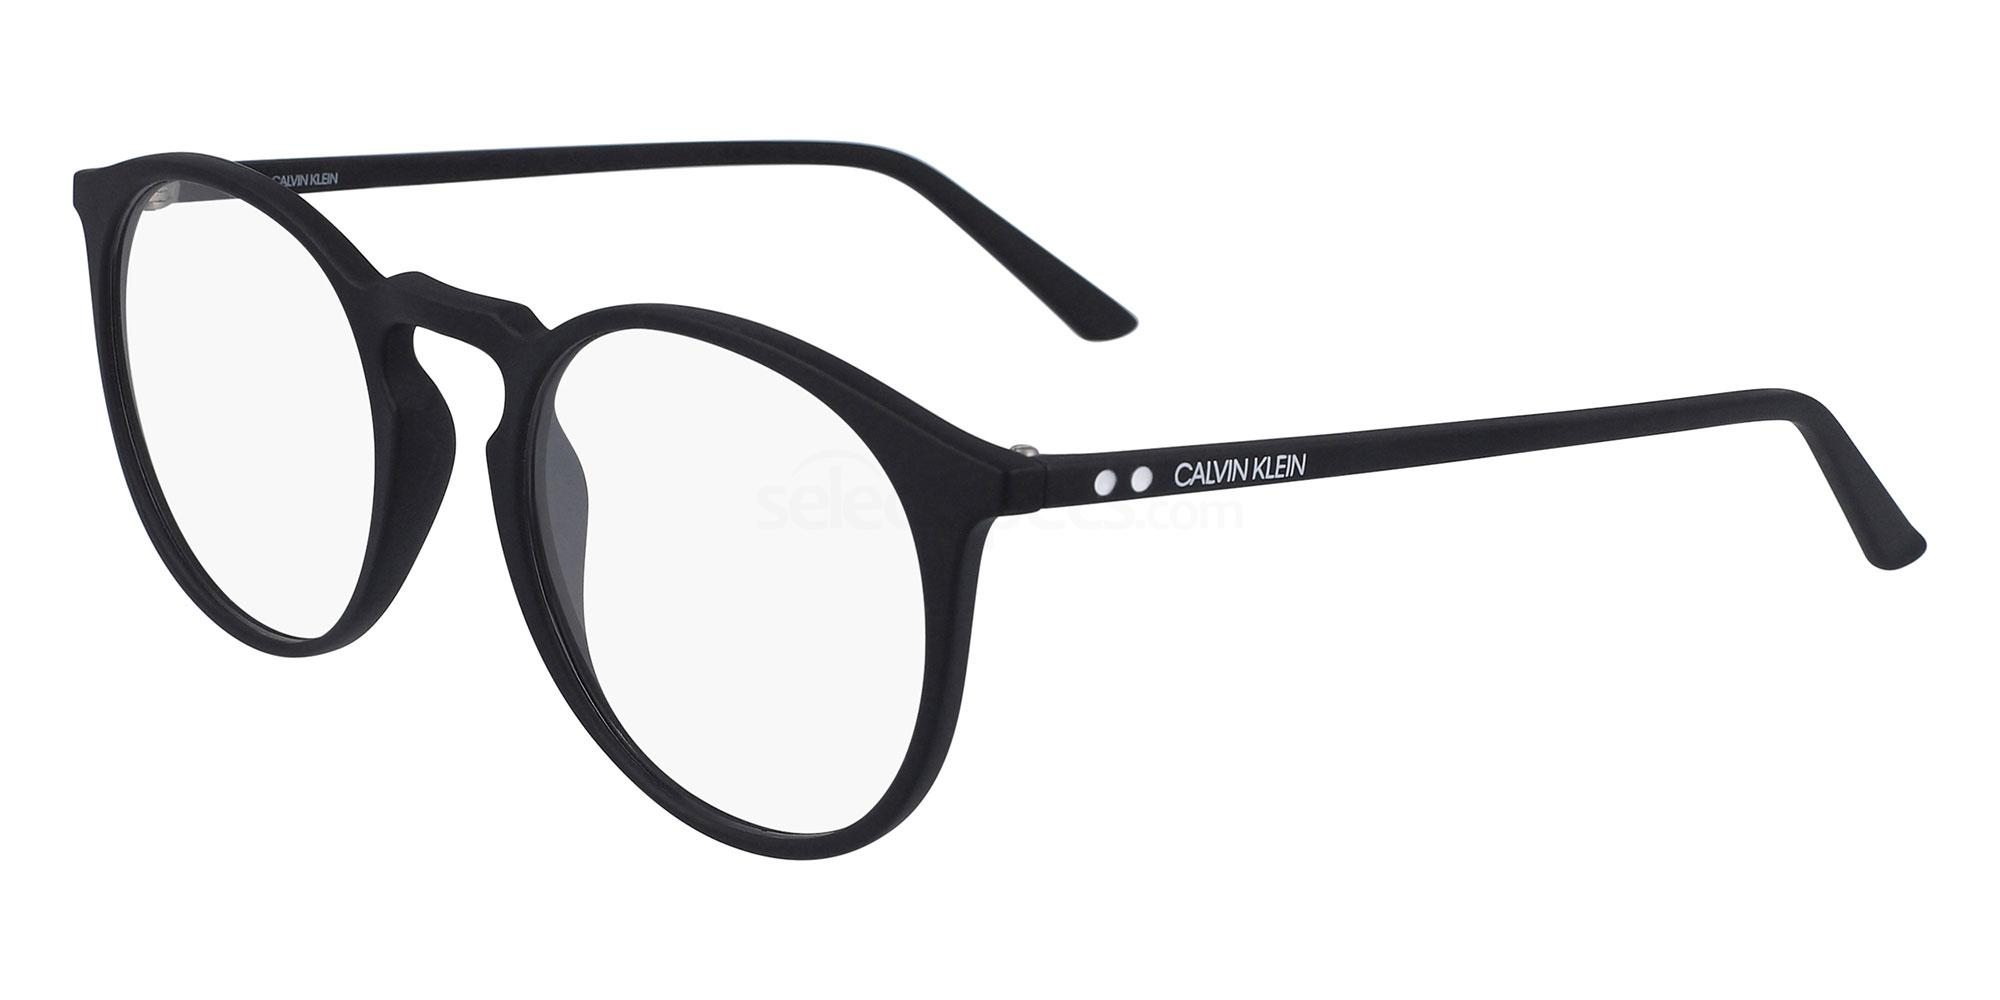 001 CK19517 Glasses, Calvin Klein